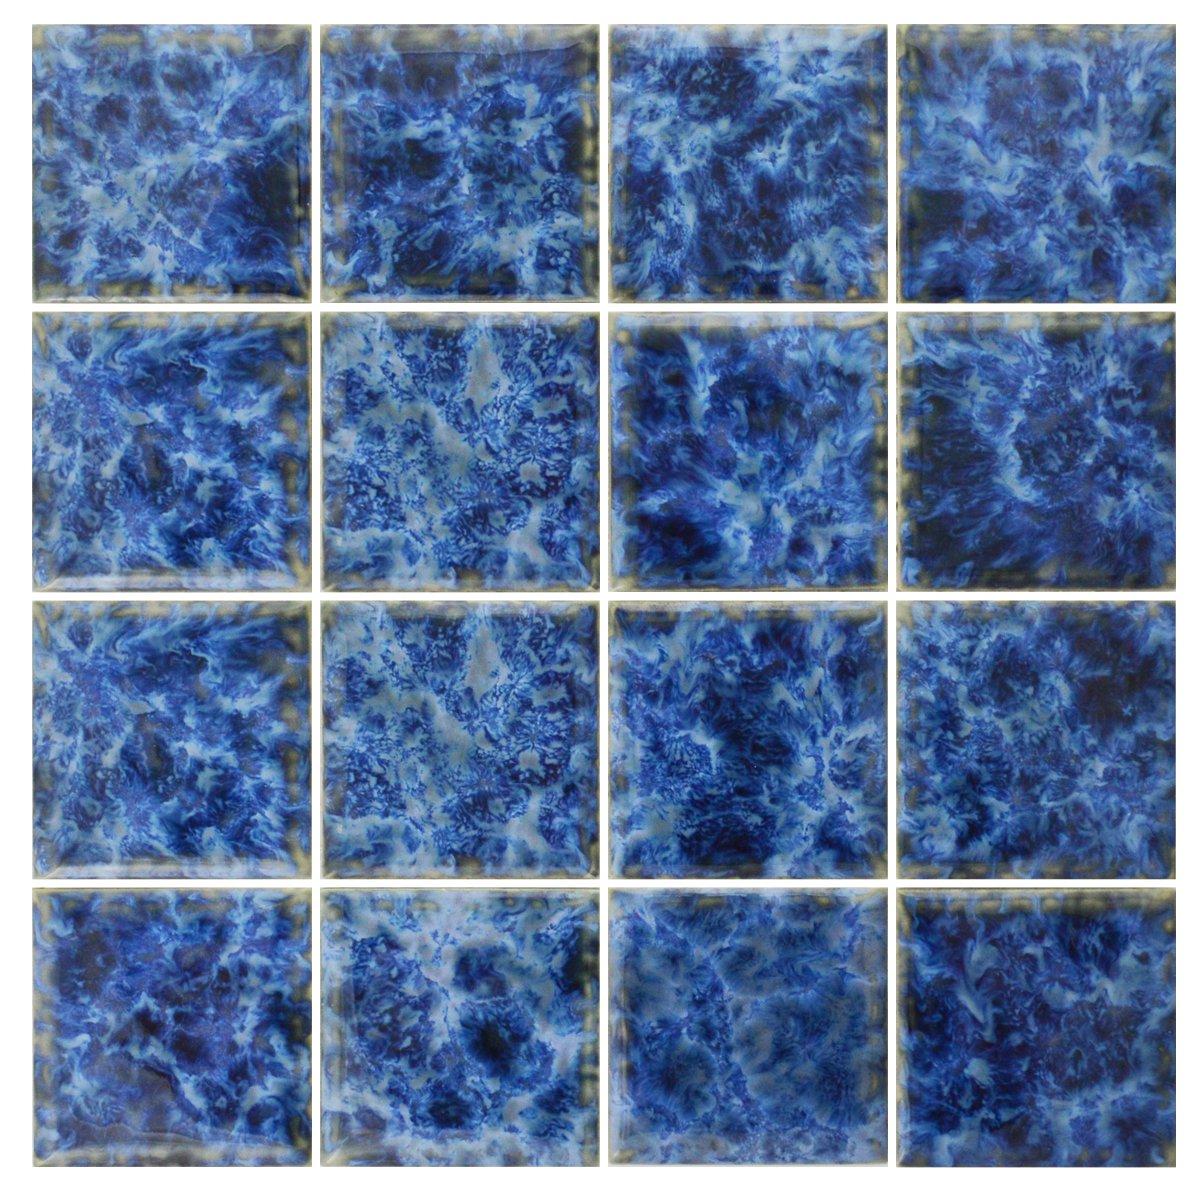 Amazon.com: 5 SF 3x3 Sea Blue Tile for Wall Spa Swimming Pool Shower ...